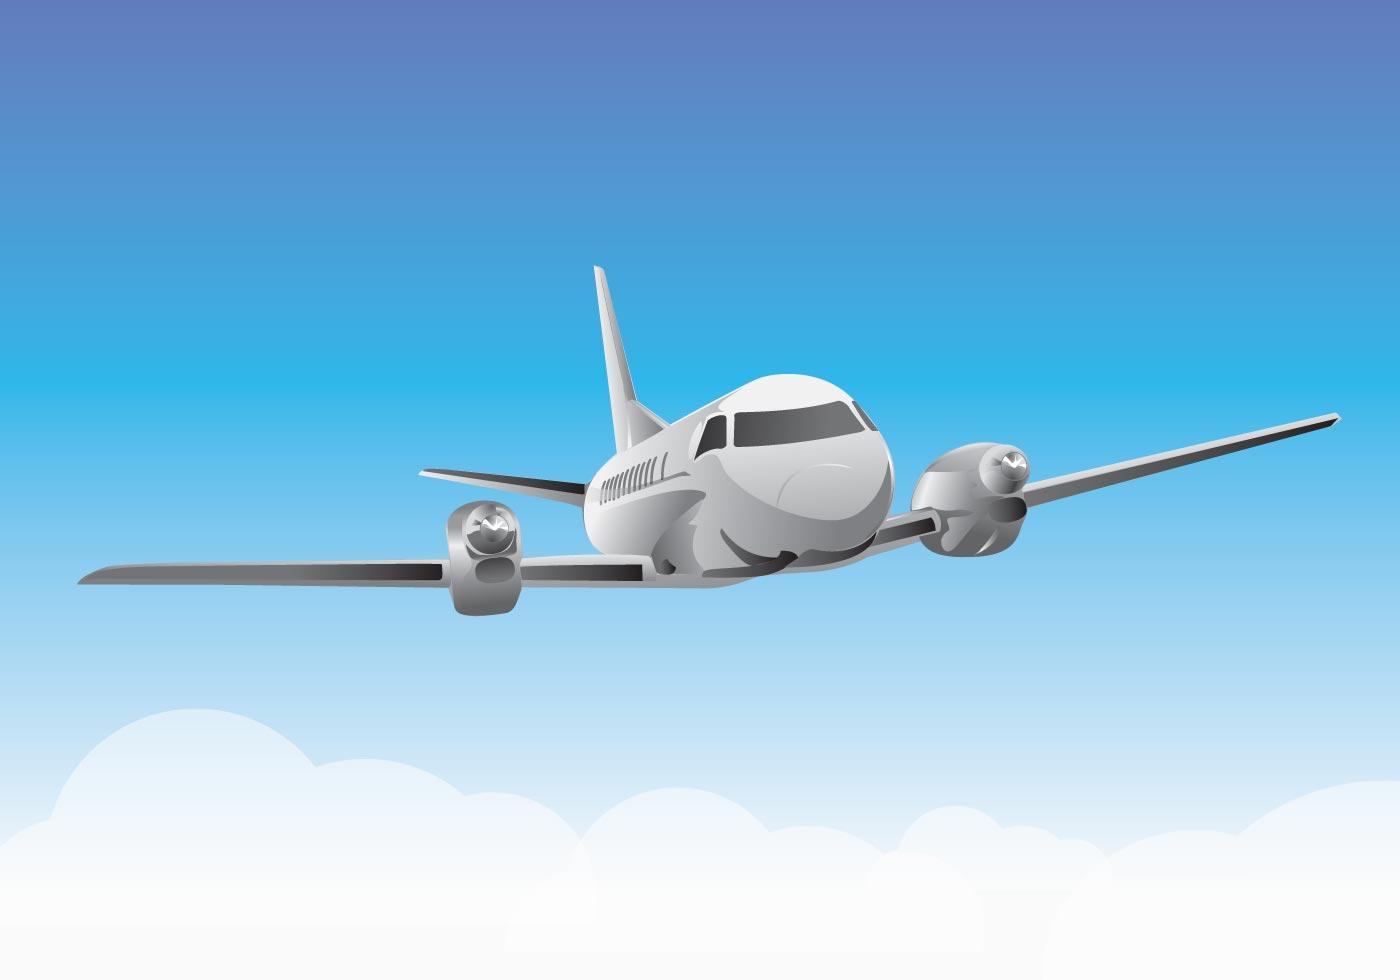 Airplane Vector - Download Free Vector Art, Stock Graphics ...